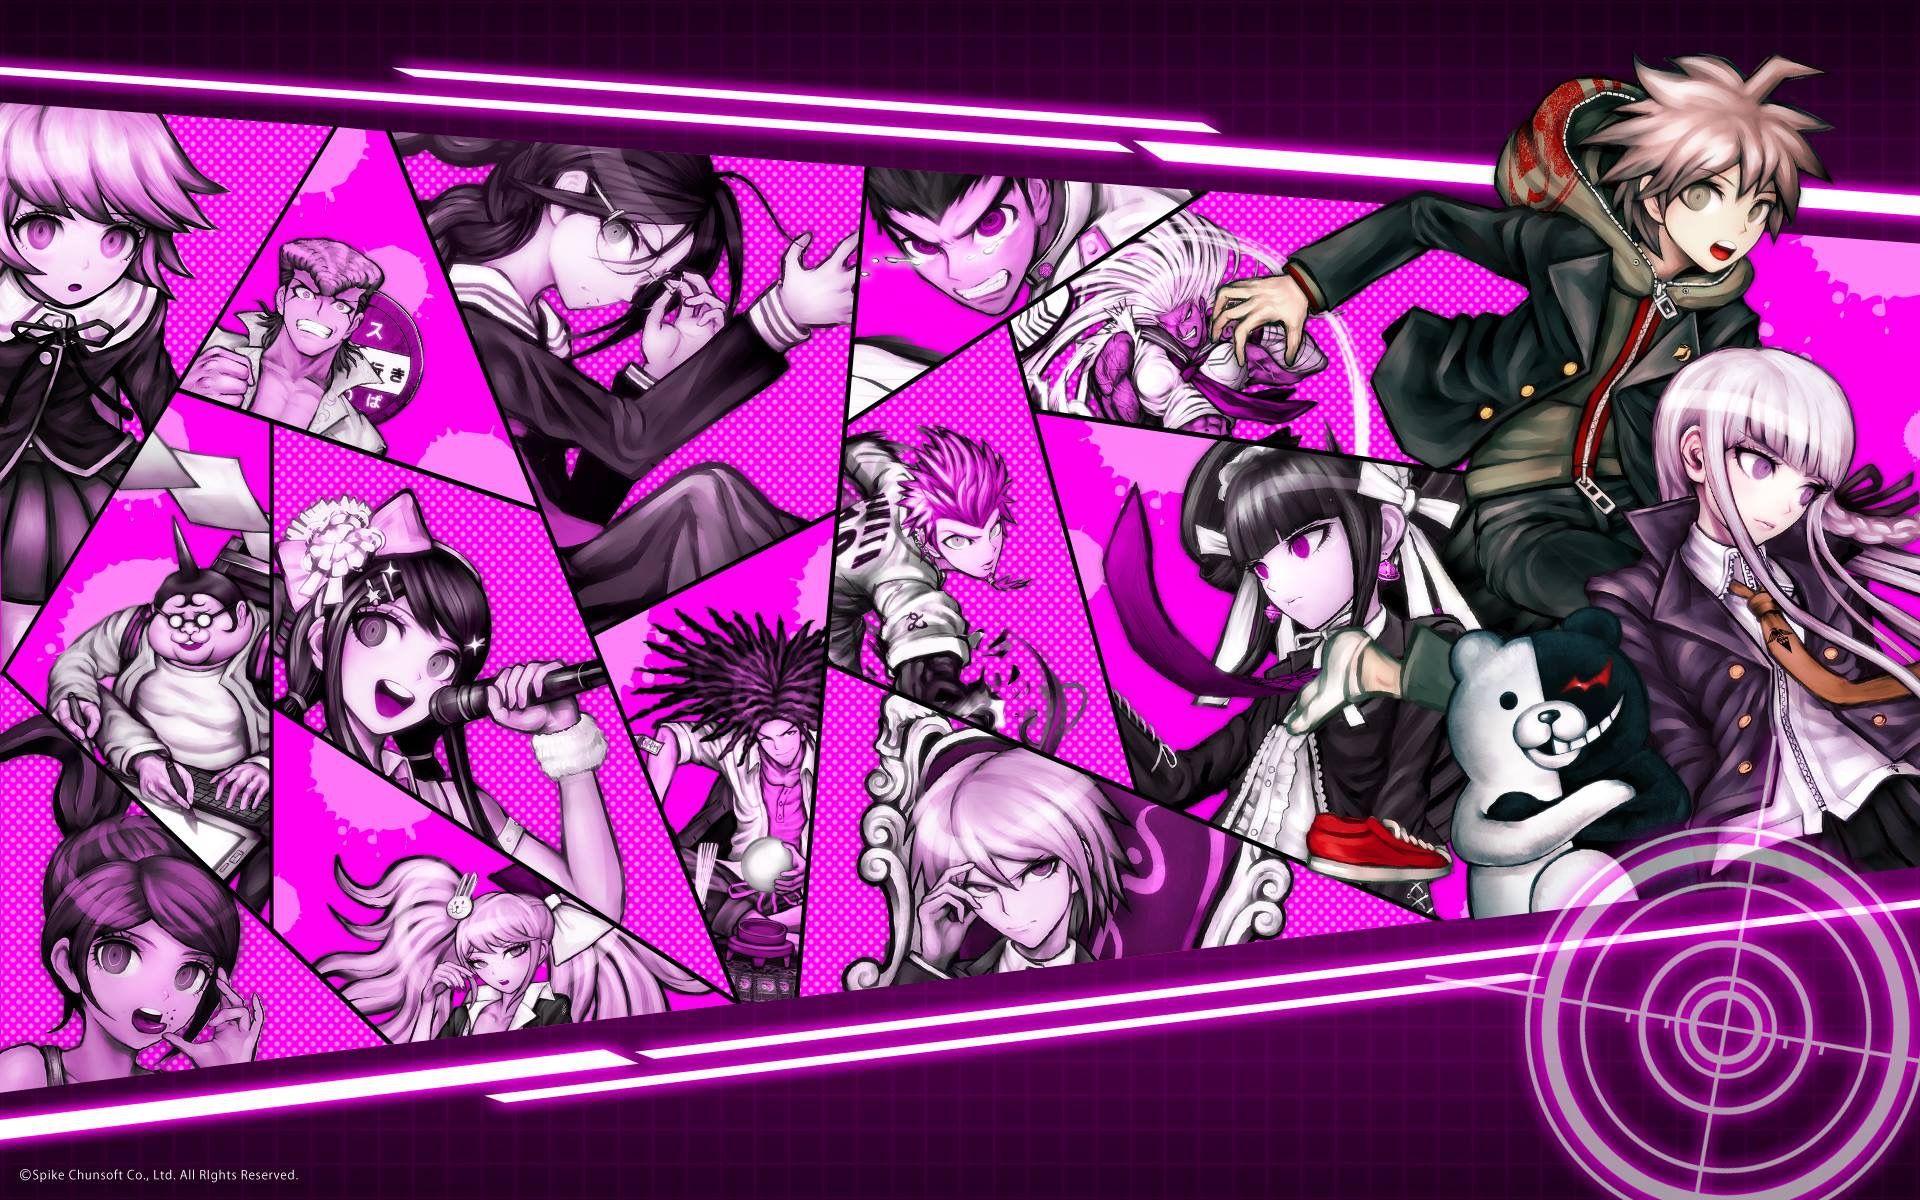 Danganronpa 1 Danganronpa Anime Anime Wallpaper